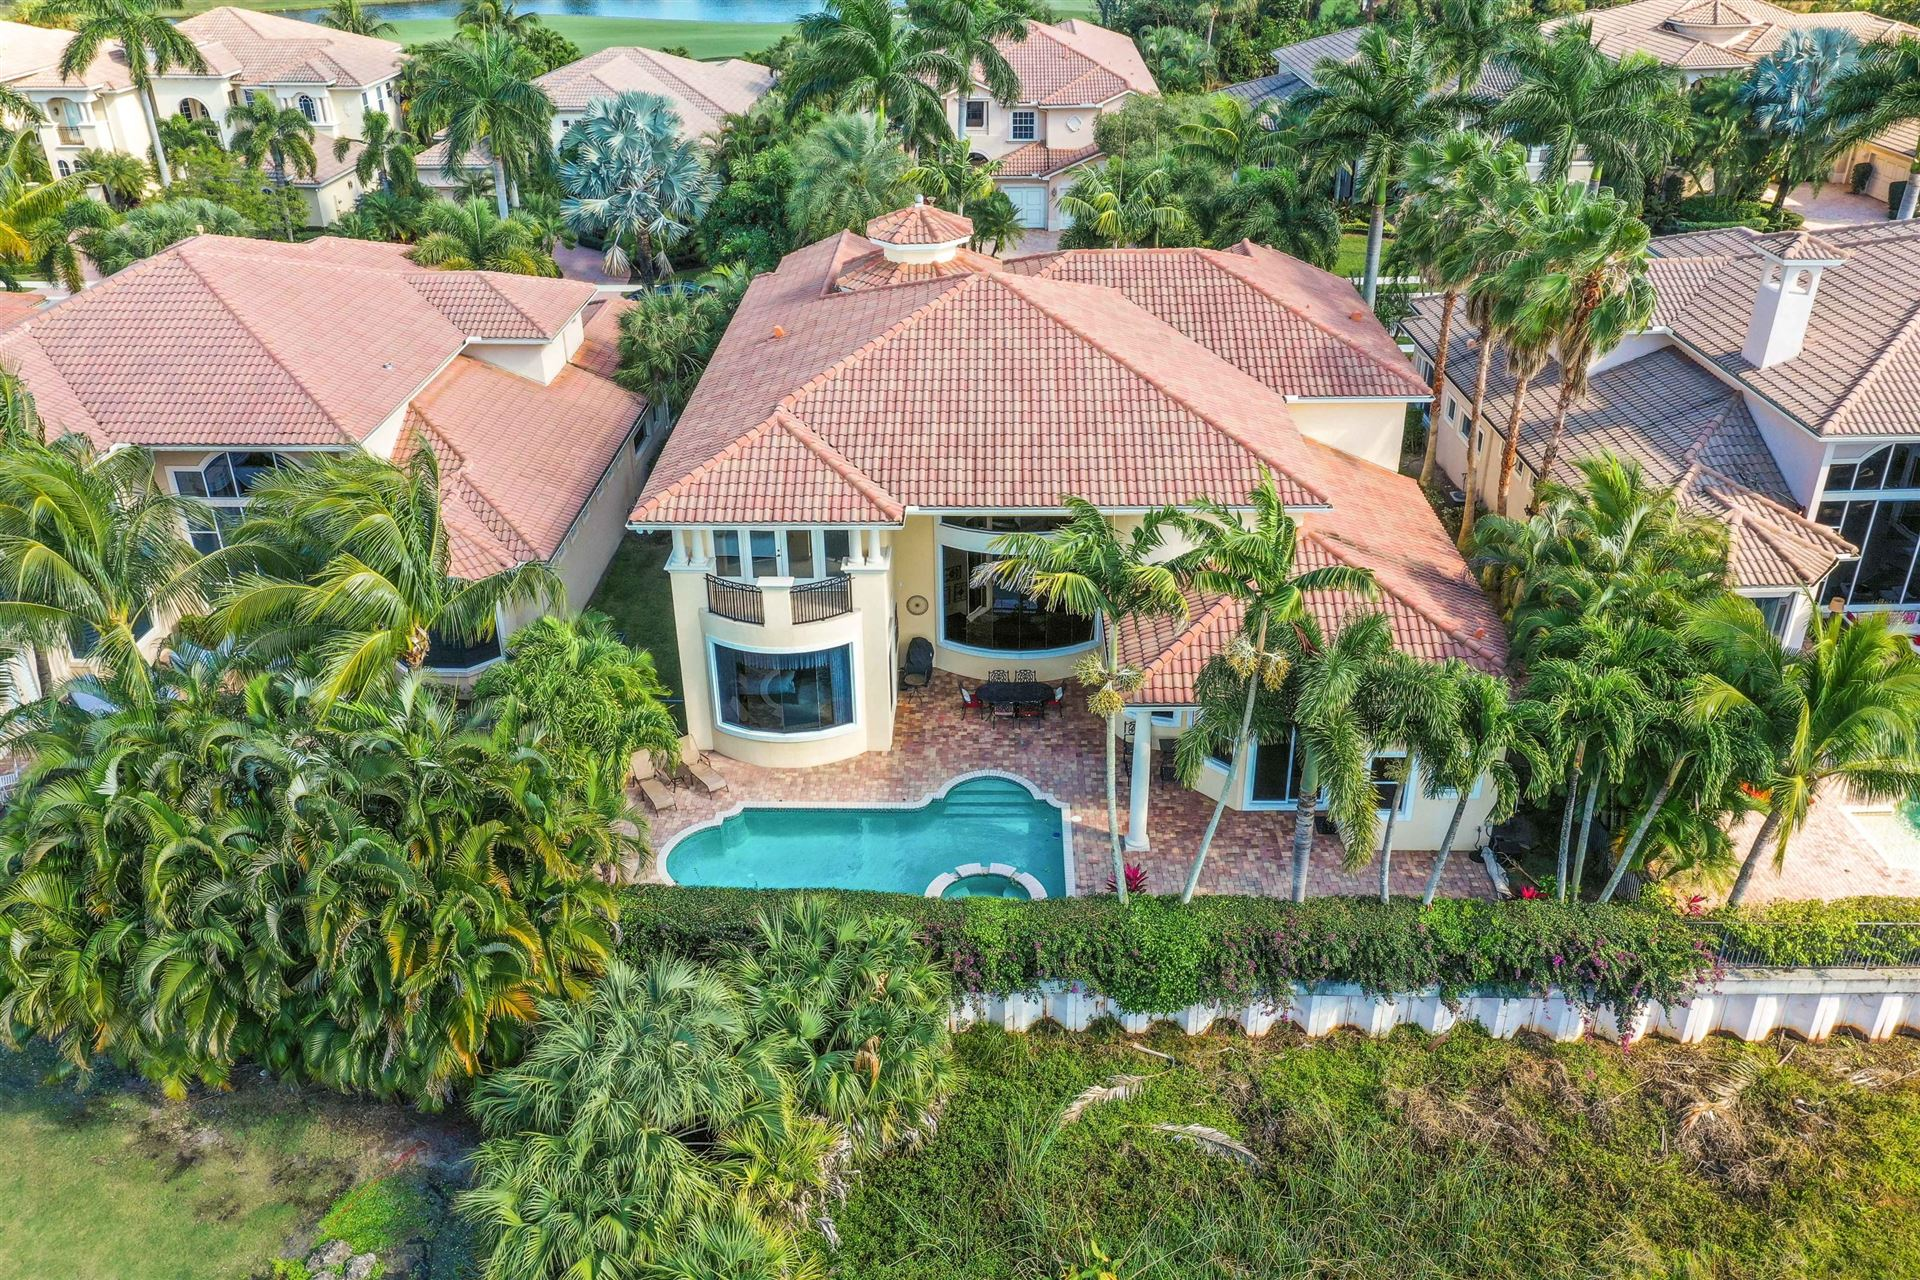 Photo of 405 Savoie Drive, Palm Beach Gardens, FL 33410 (MLS # RX-10597734)